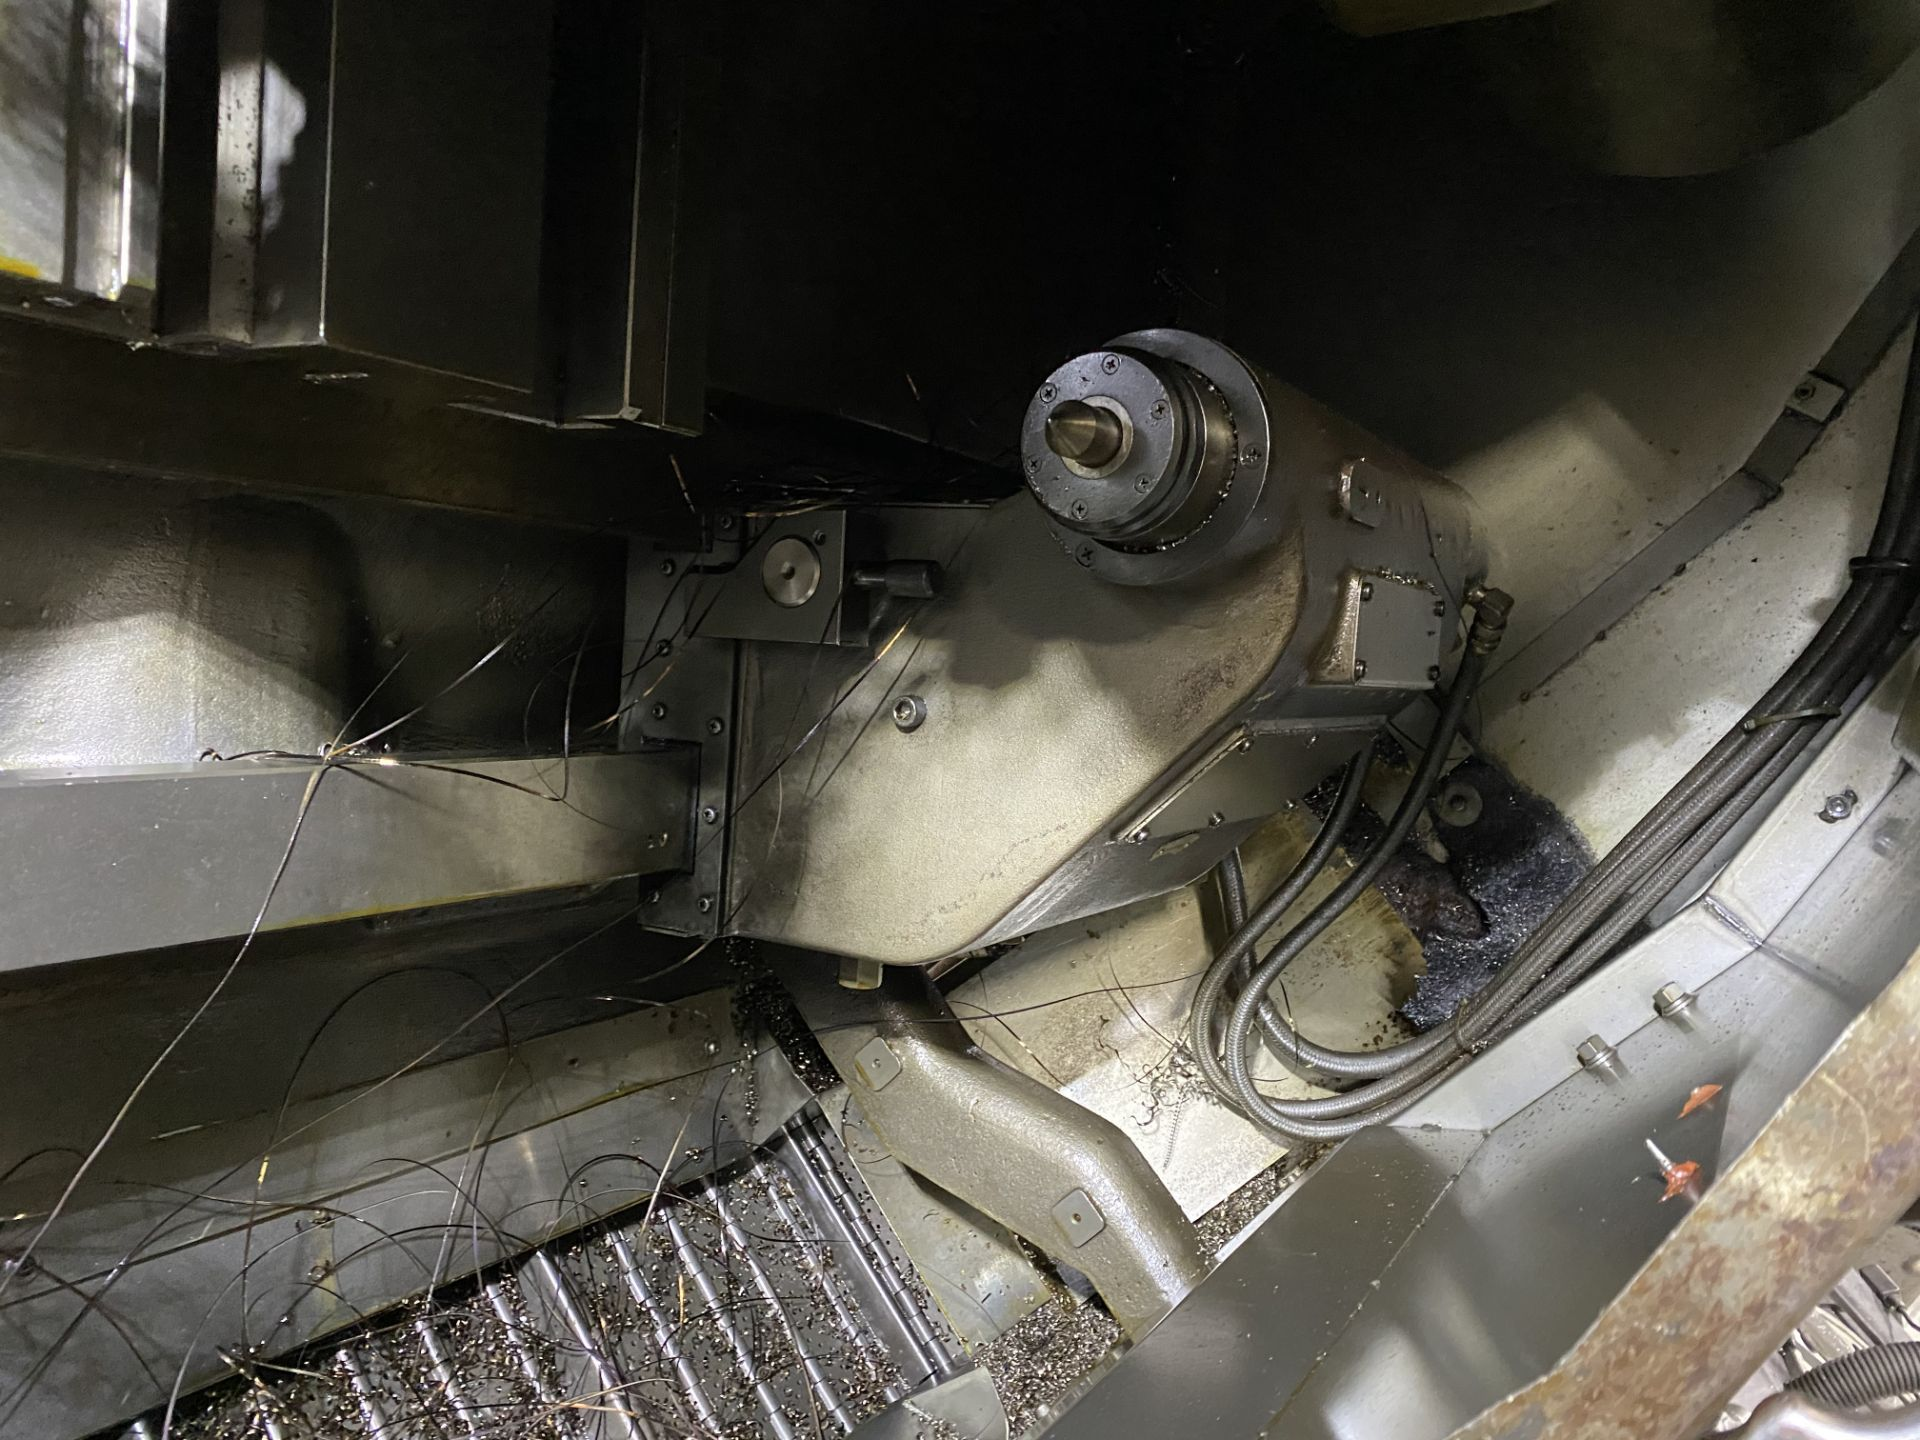 Mori Seiki SL-25M5 CNC Lathe - Image 5 of 8